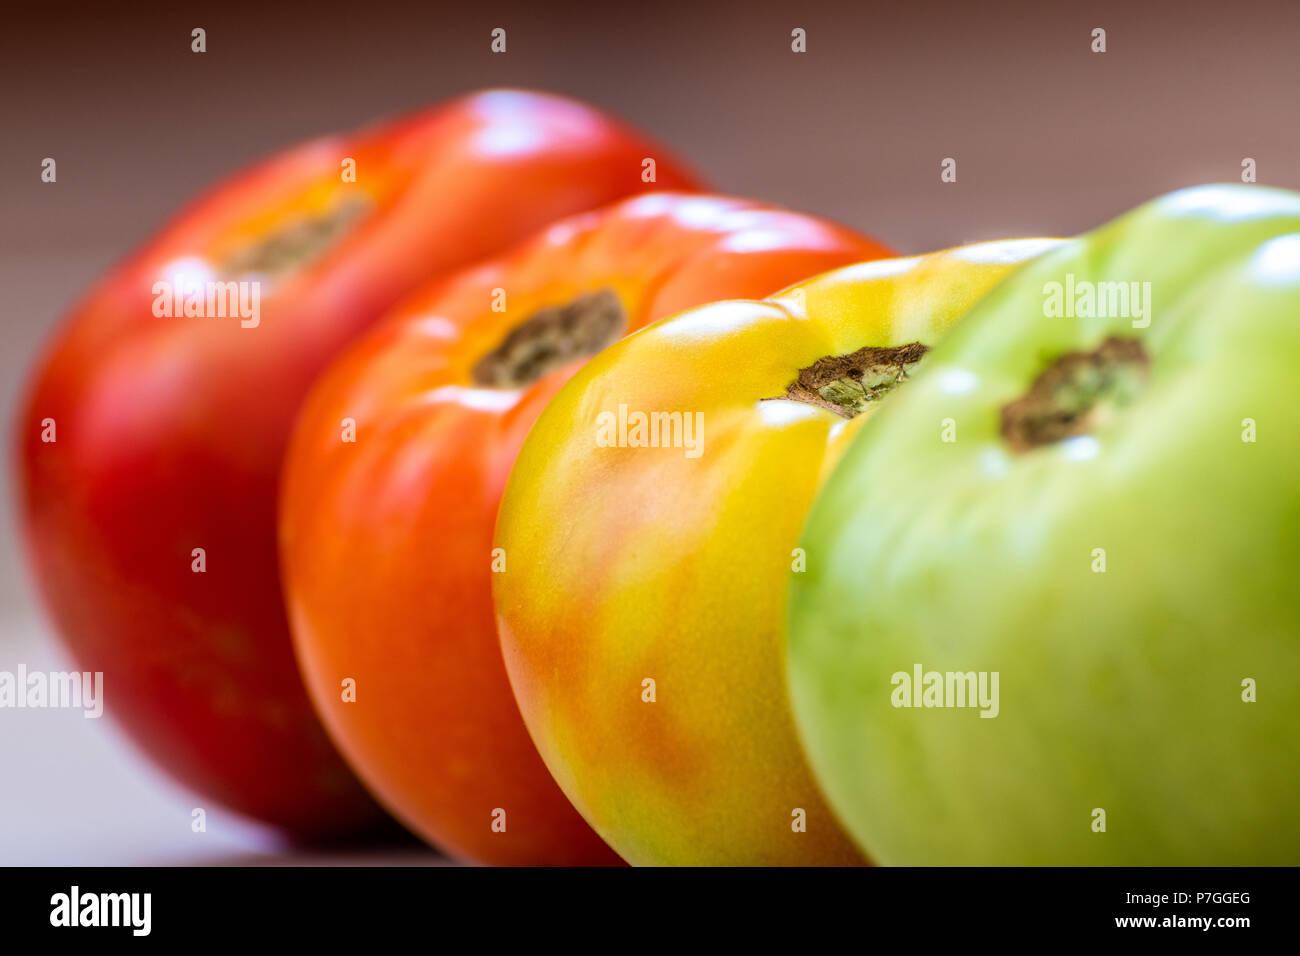 Tomates en diferentes etapas de maduración. Concepto. Se centra en la transformación de tomate. Las etapas son de color verde, a continuación, girando luego luz roja y luego rojo. Imagen De Stock